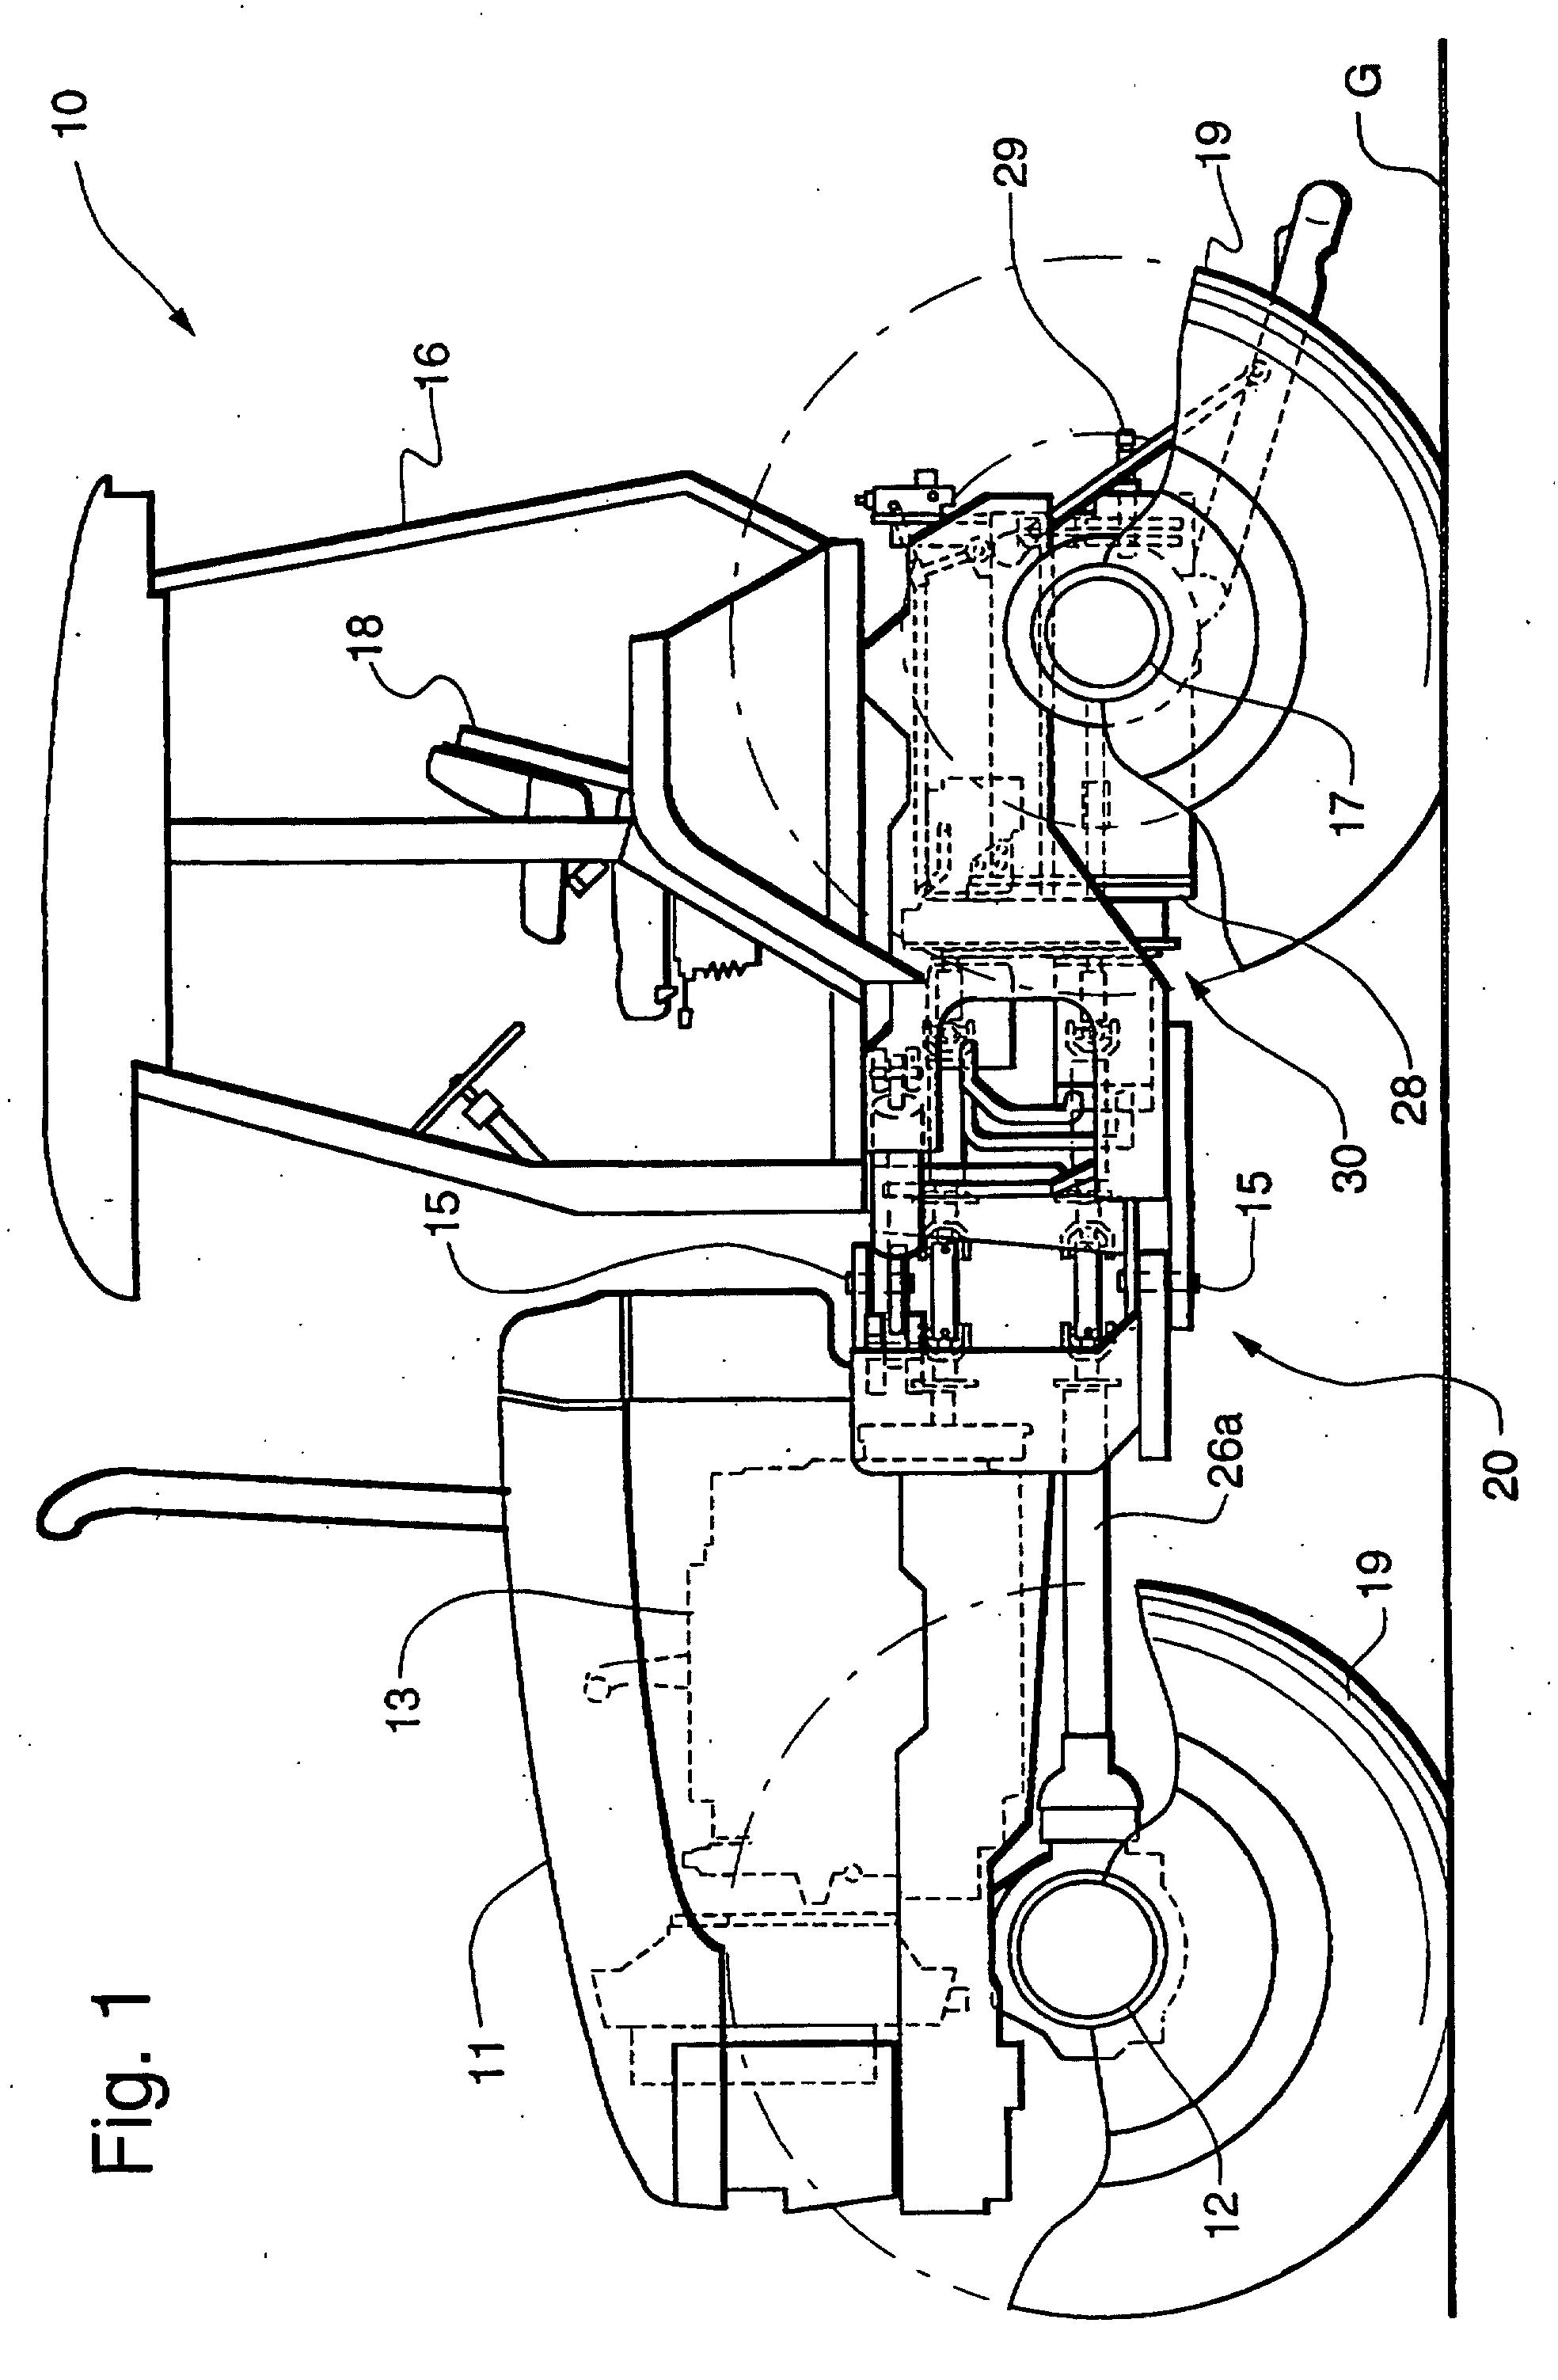 Cat Backhoe Hydraulic Schematic